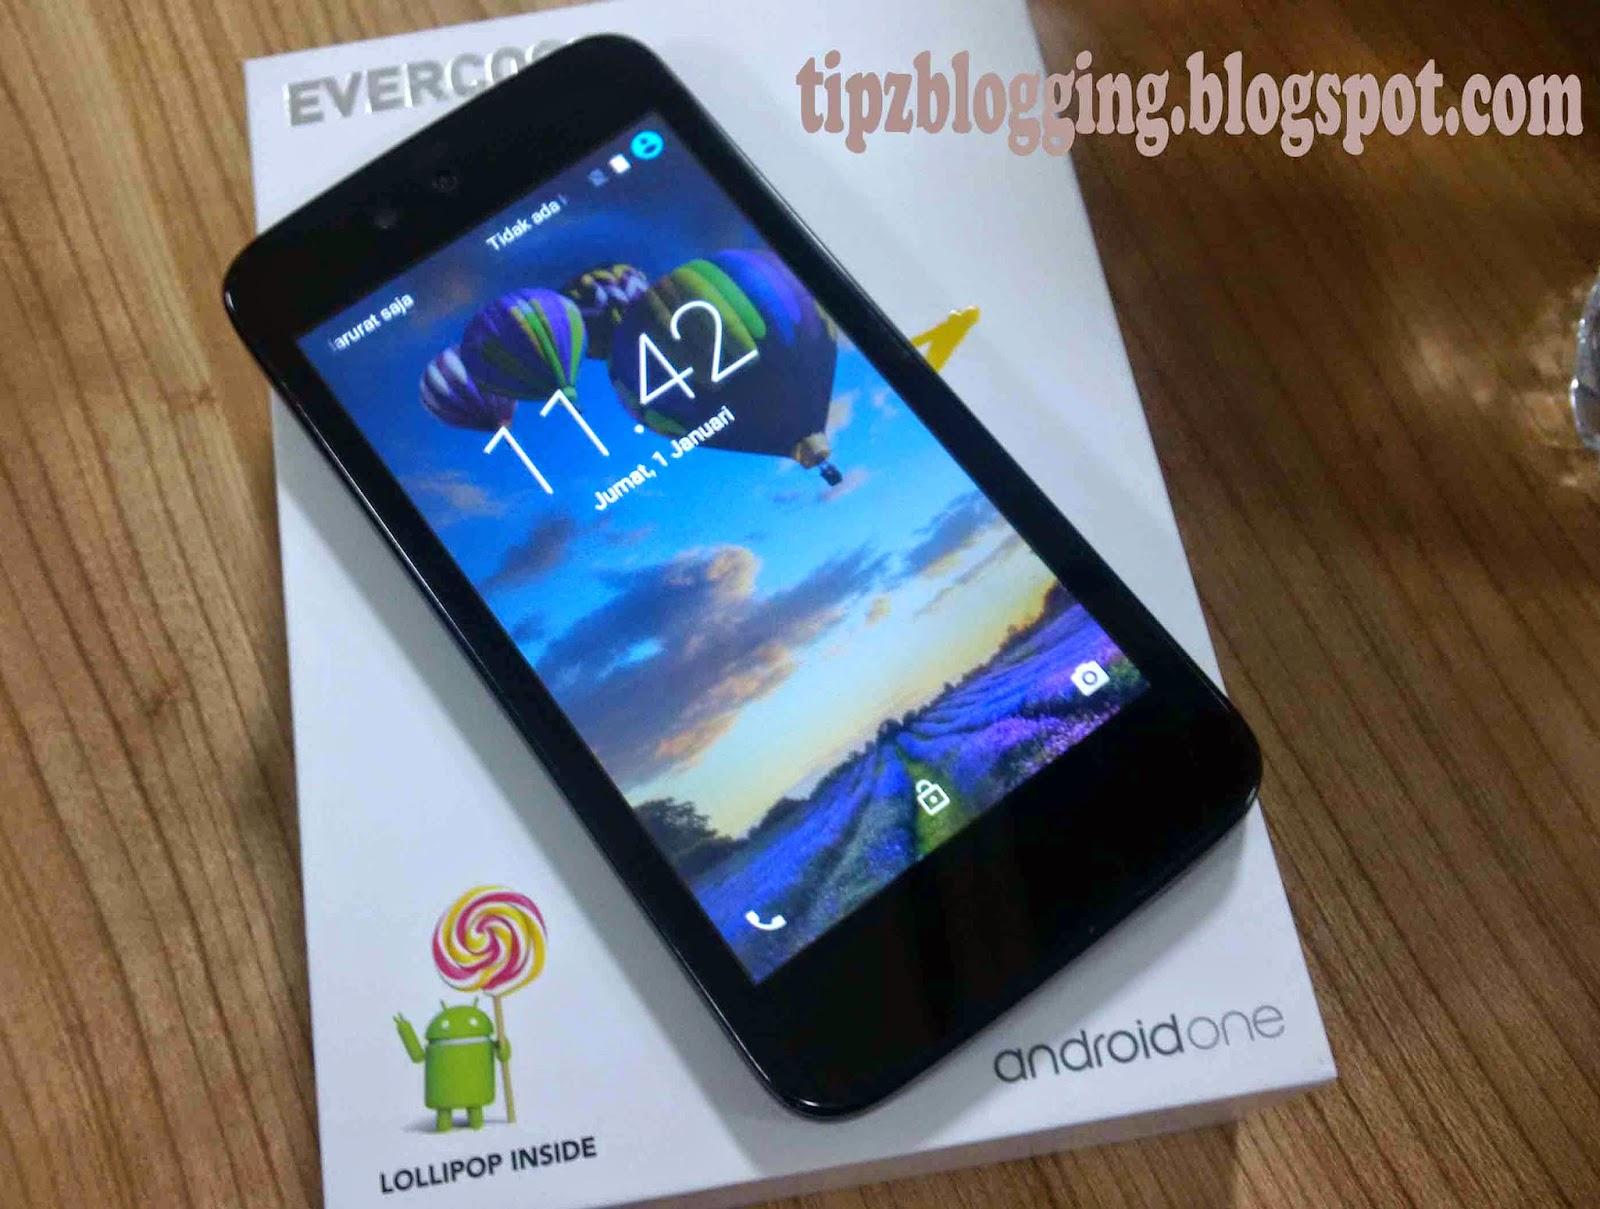 Harga HP Evercoss One X Android One Terbaru Plus Speknya